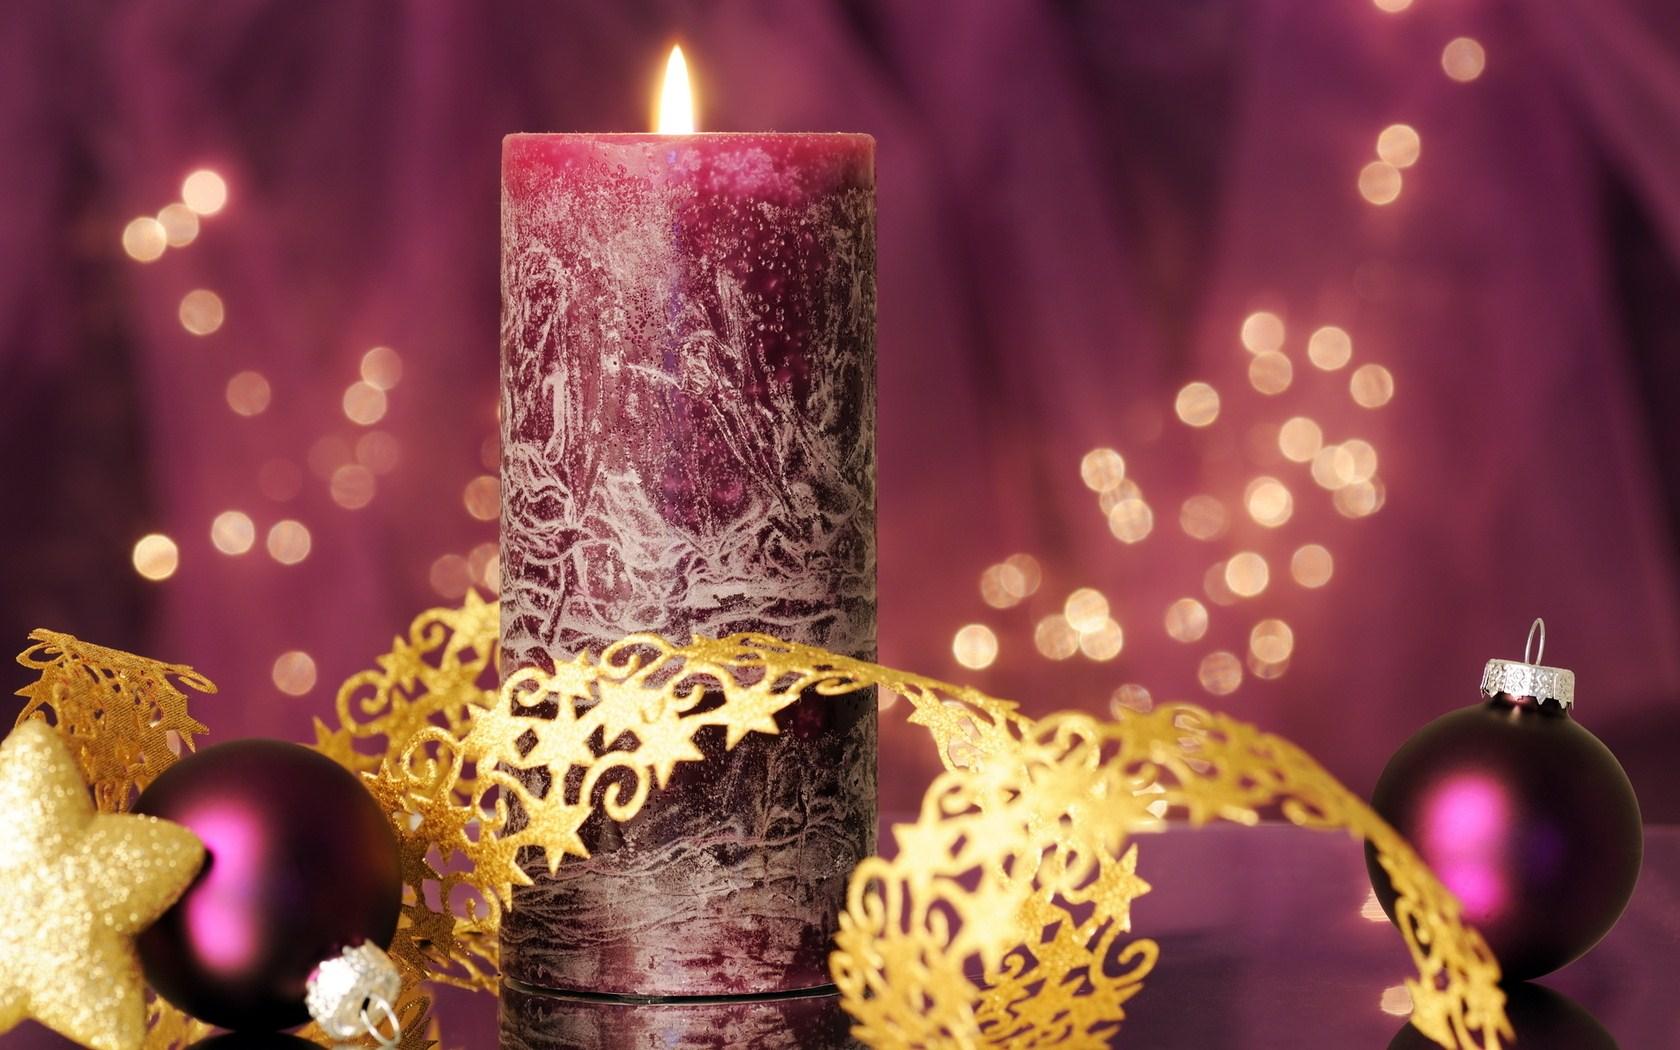 hd wallpapers christmas lights 48 wallpapers adorable wallpapers - Candle Christmas Lights